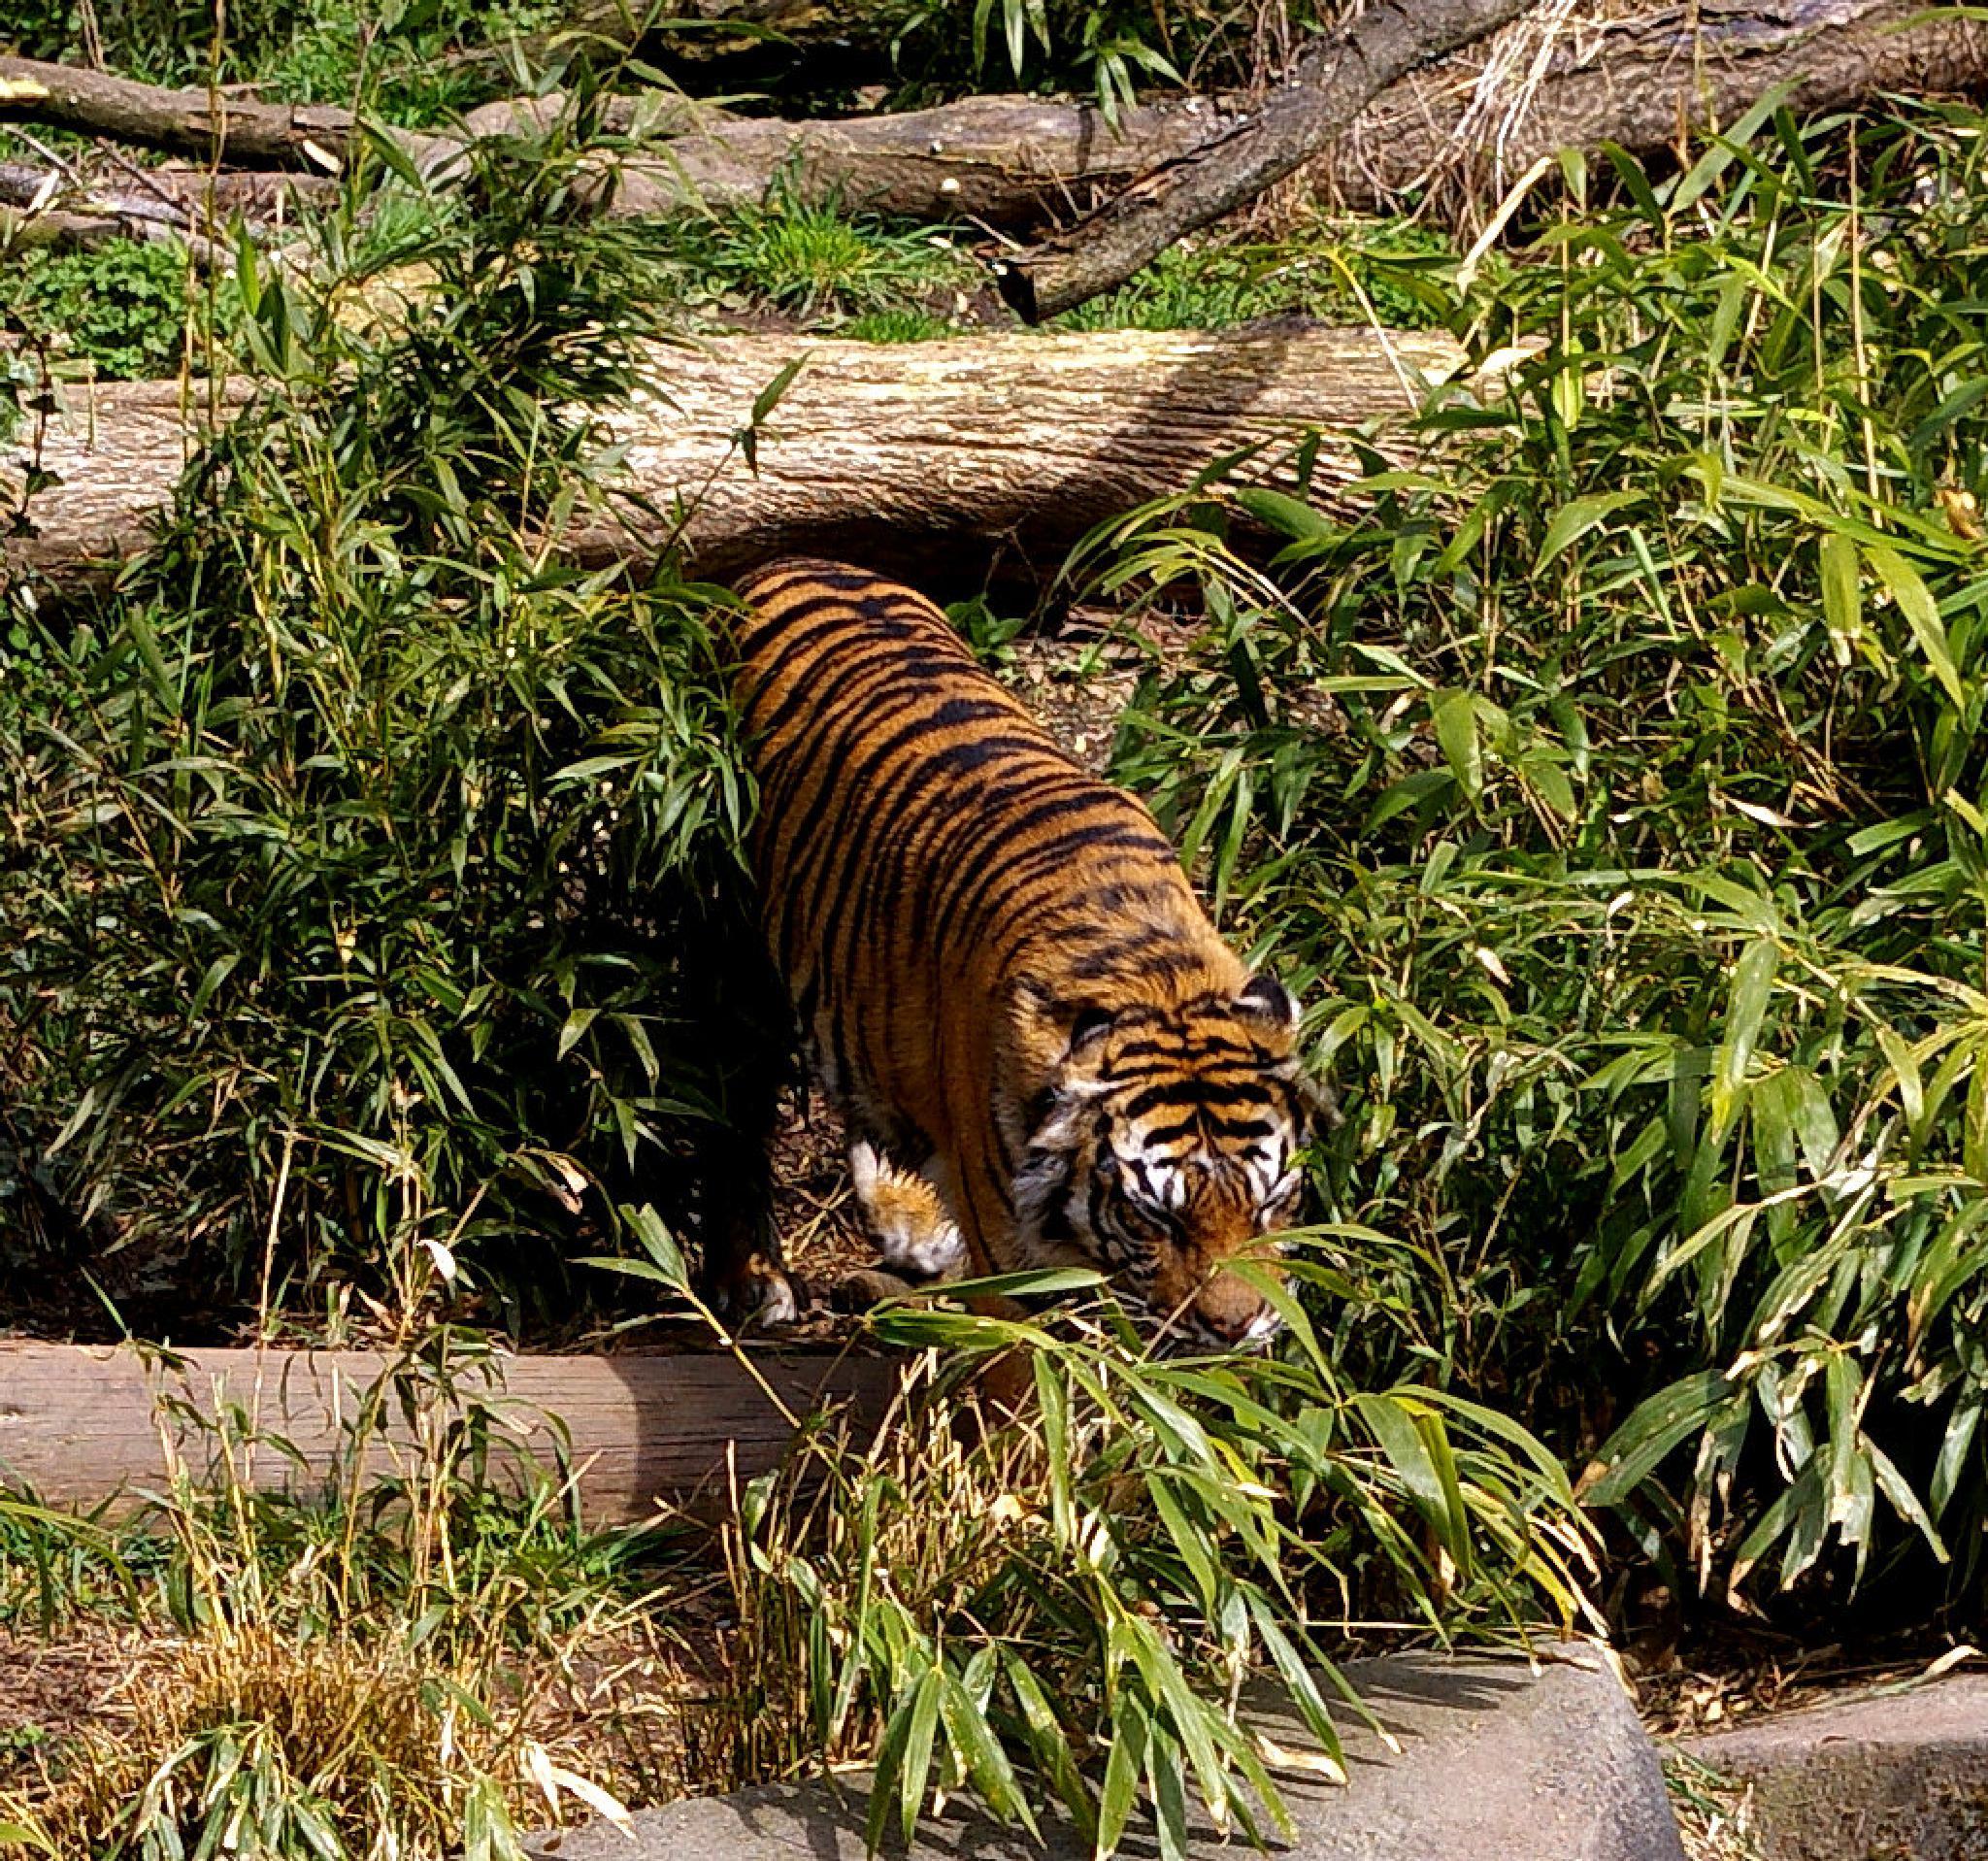 tiger by tawnye.richards